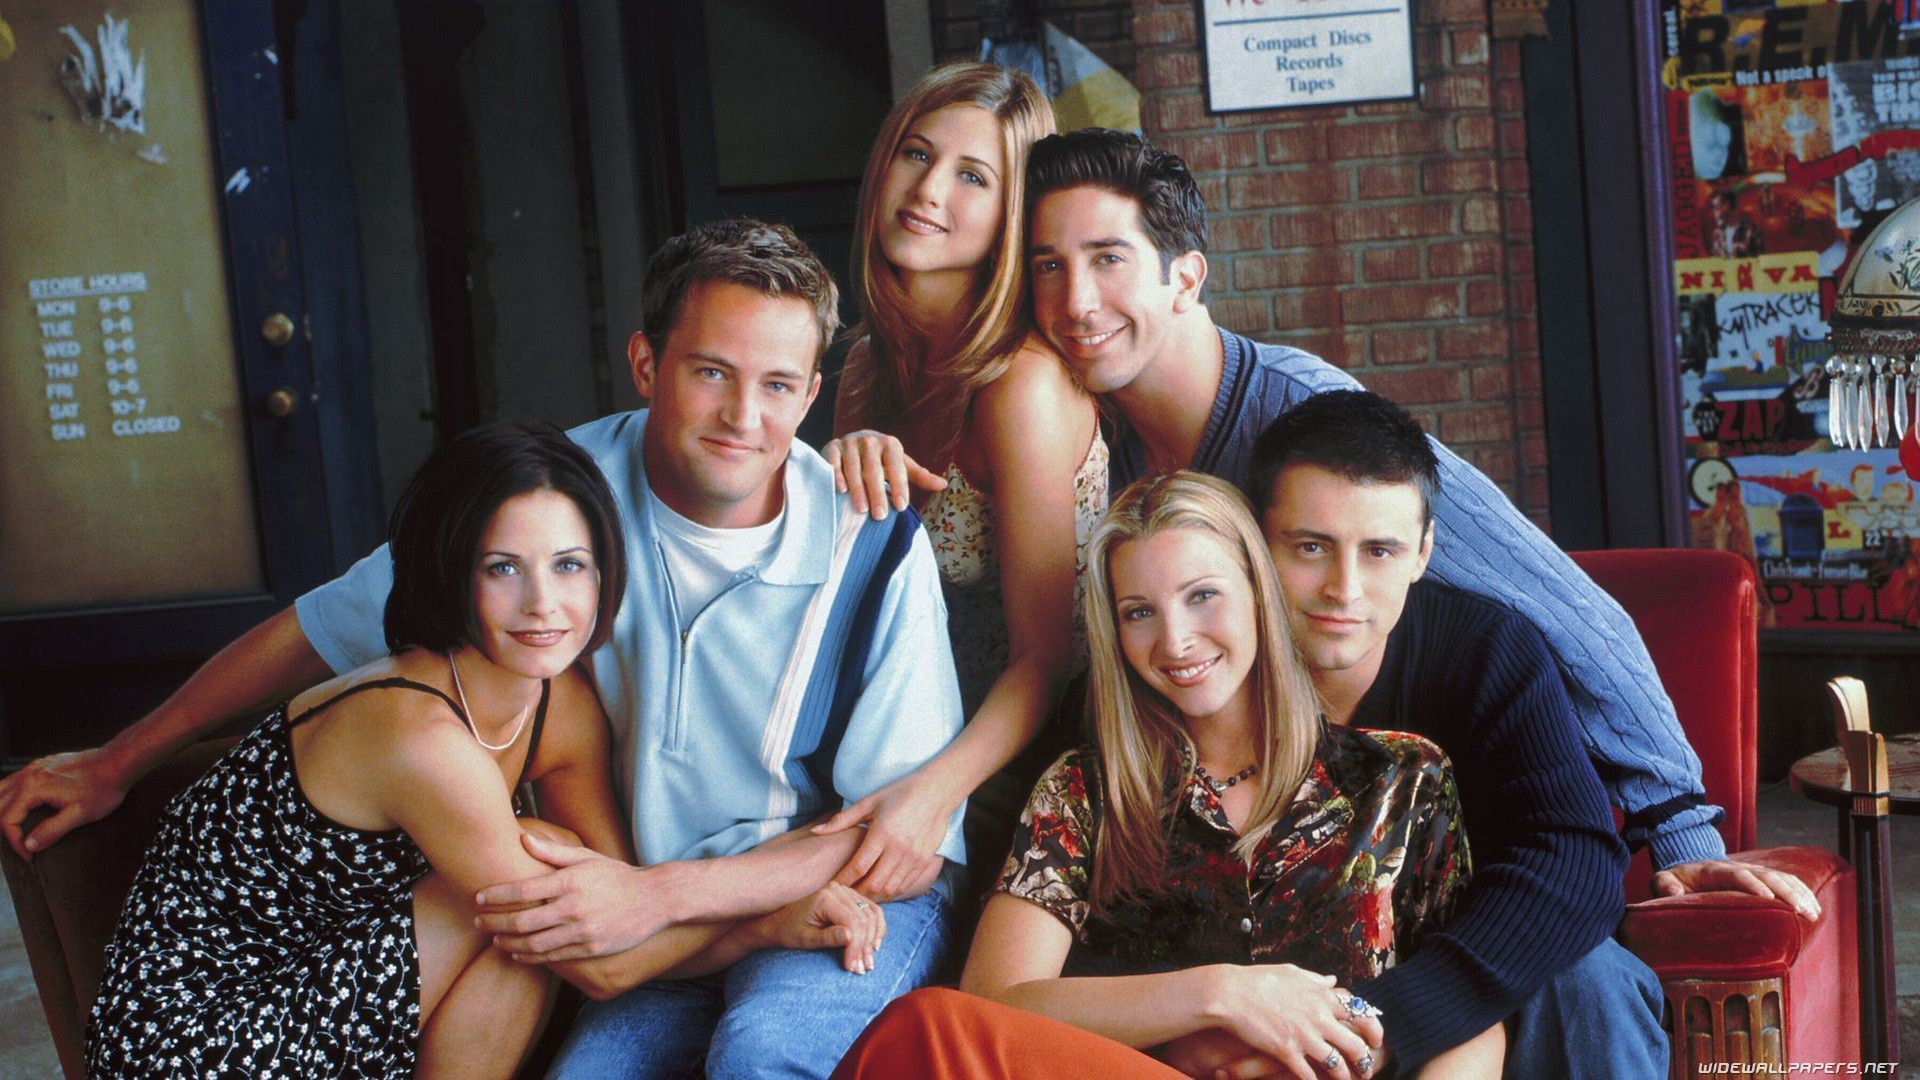 Friends TV Show Wallpapers - Wallpaper Cave